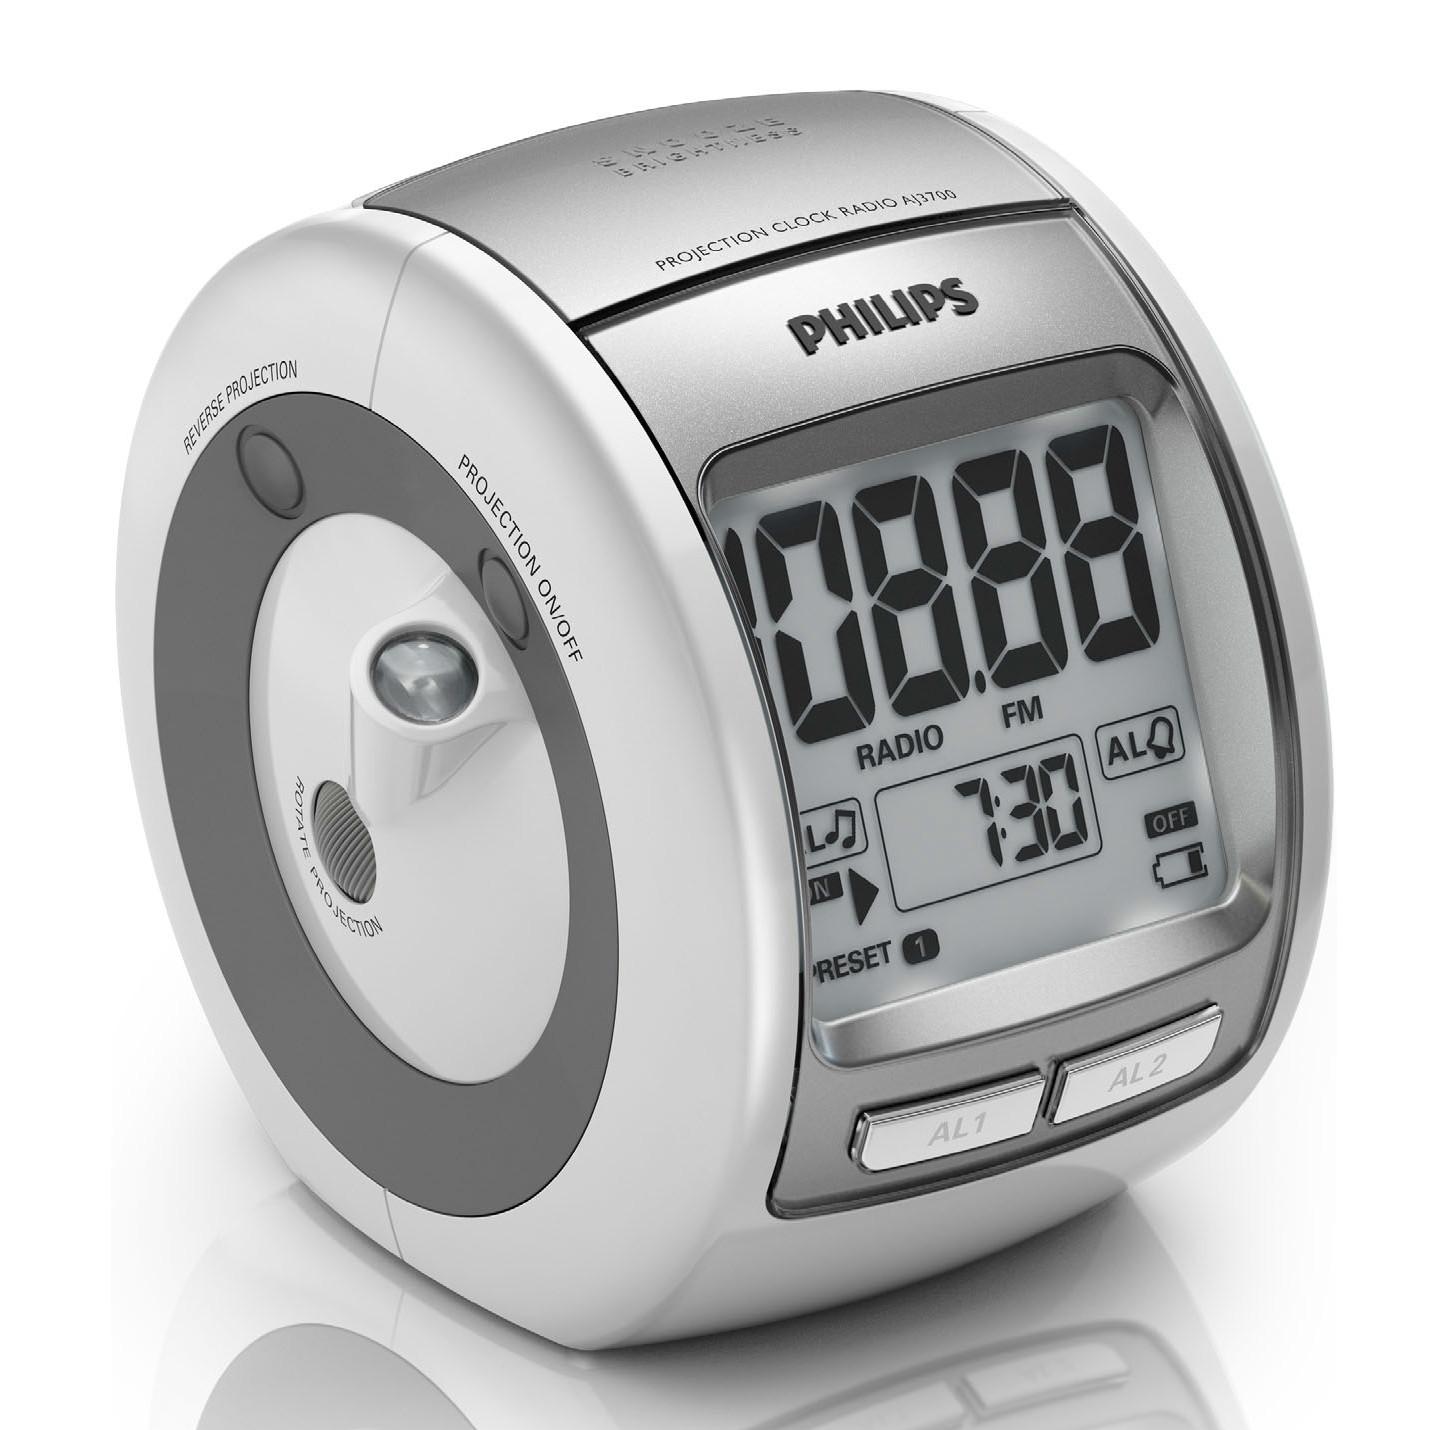 Radio & radio réveil Philips AJ3700 Radio réveil avec projection de l'heure